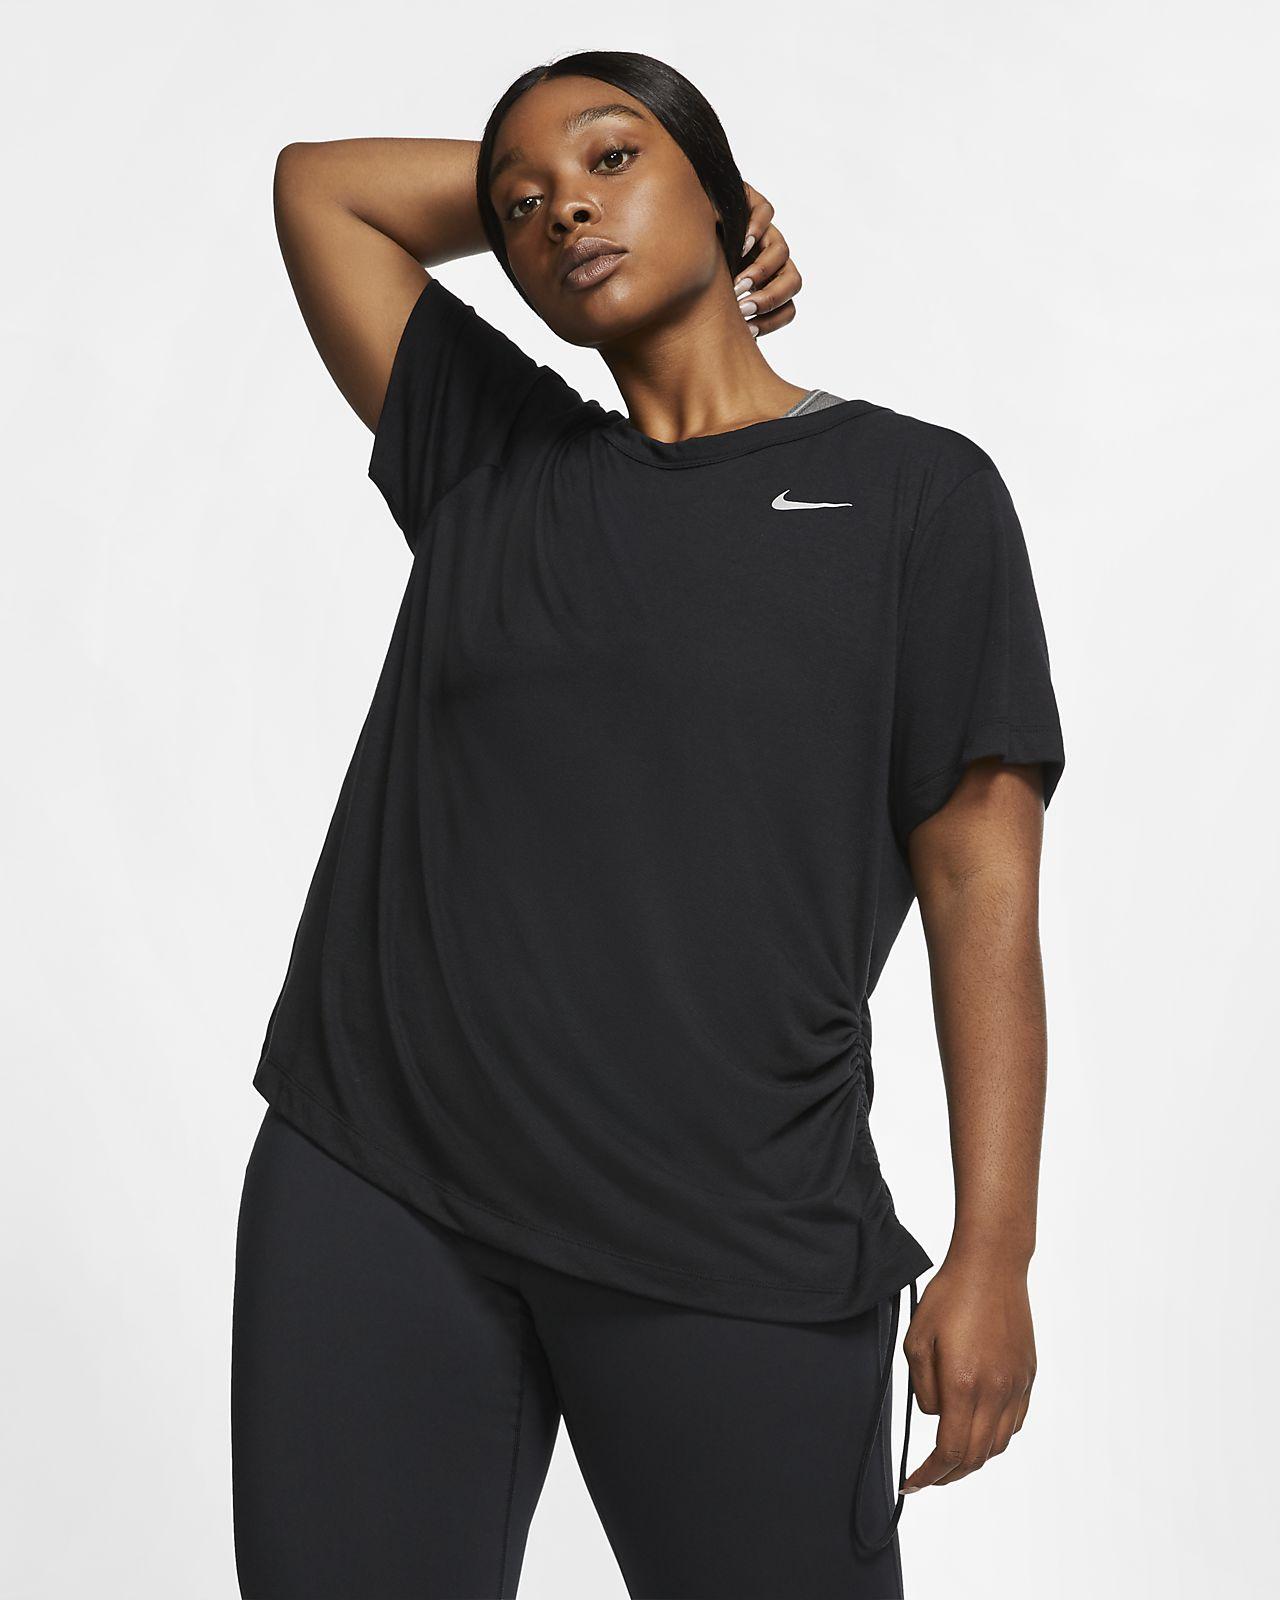 89c57c90a Nike Miler Women's Short-Sleeve Running Top (Plus Size). Nike.com